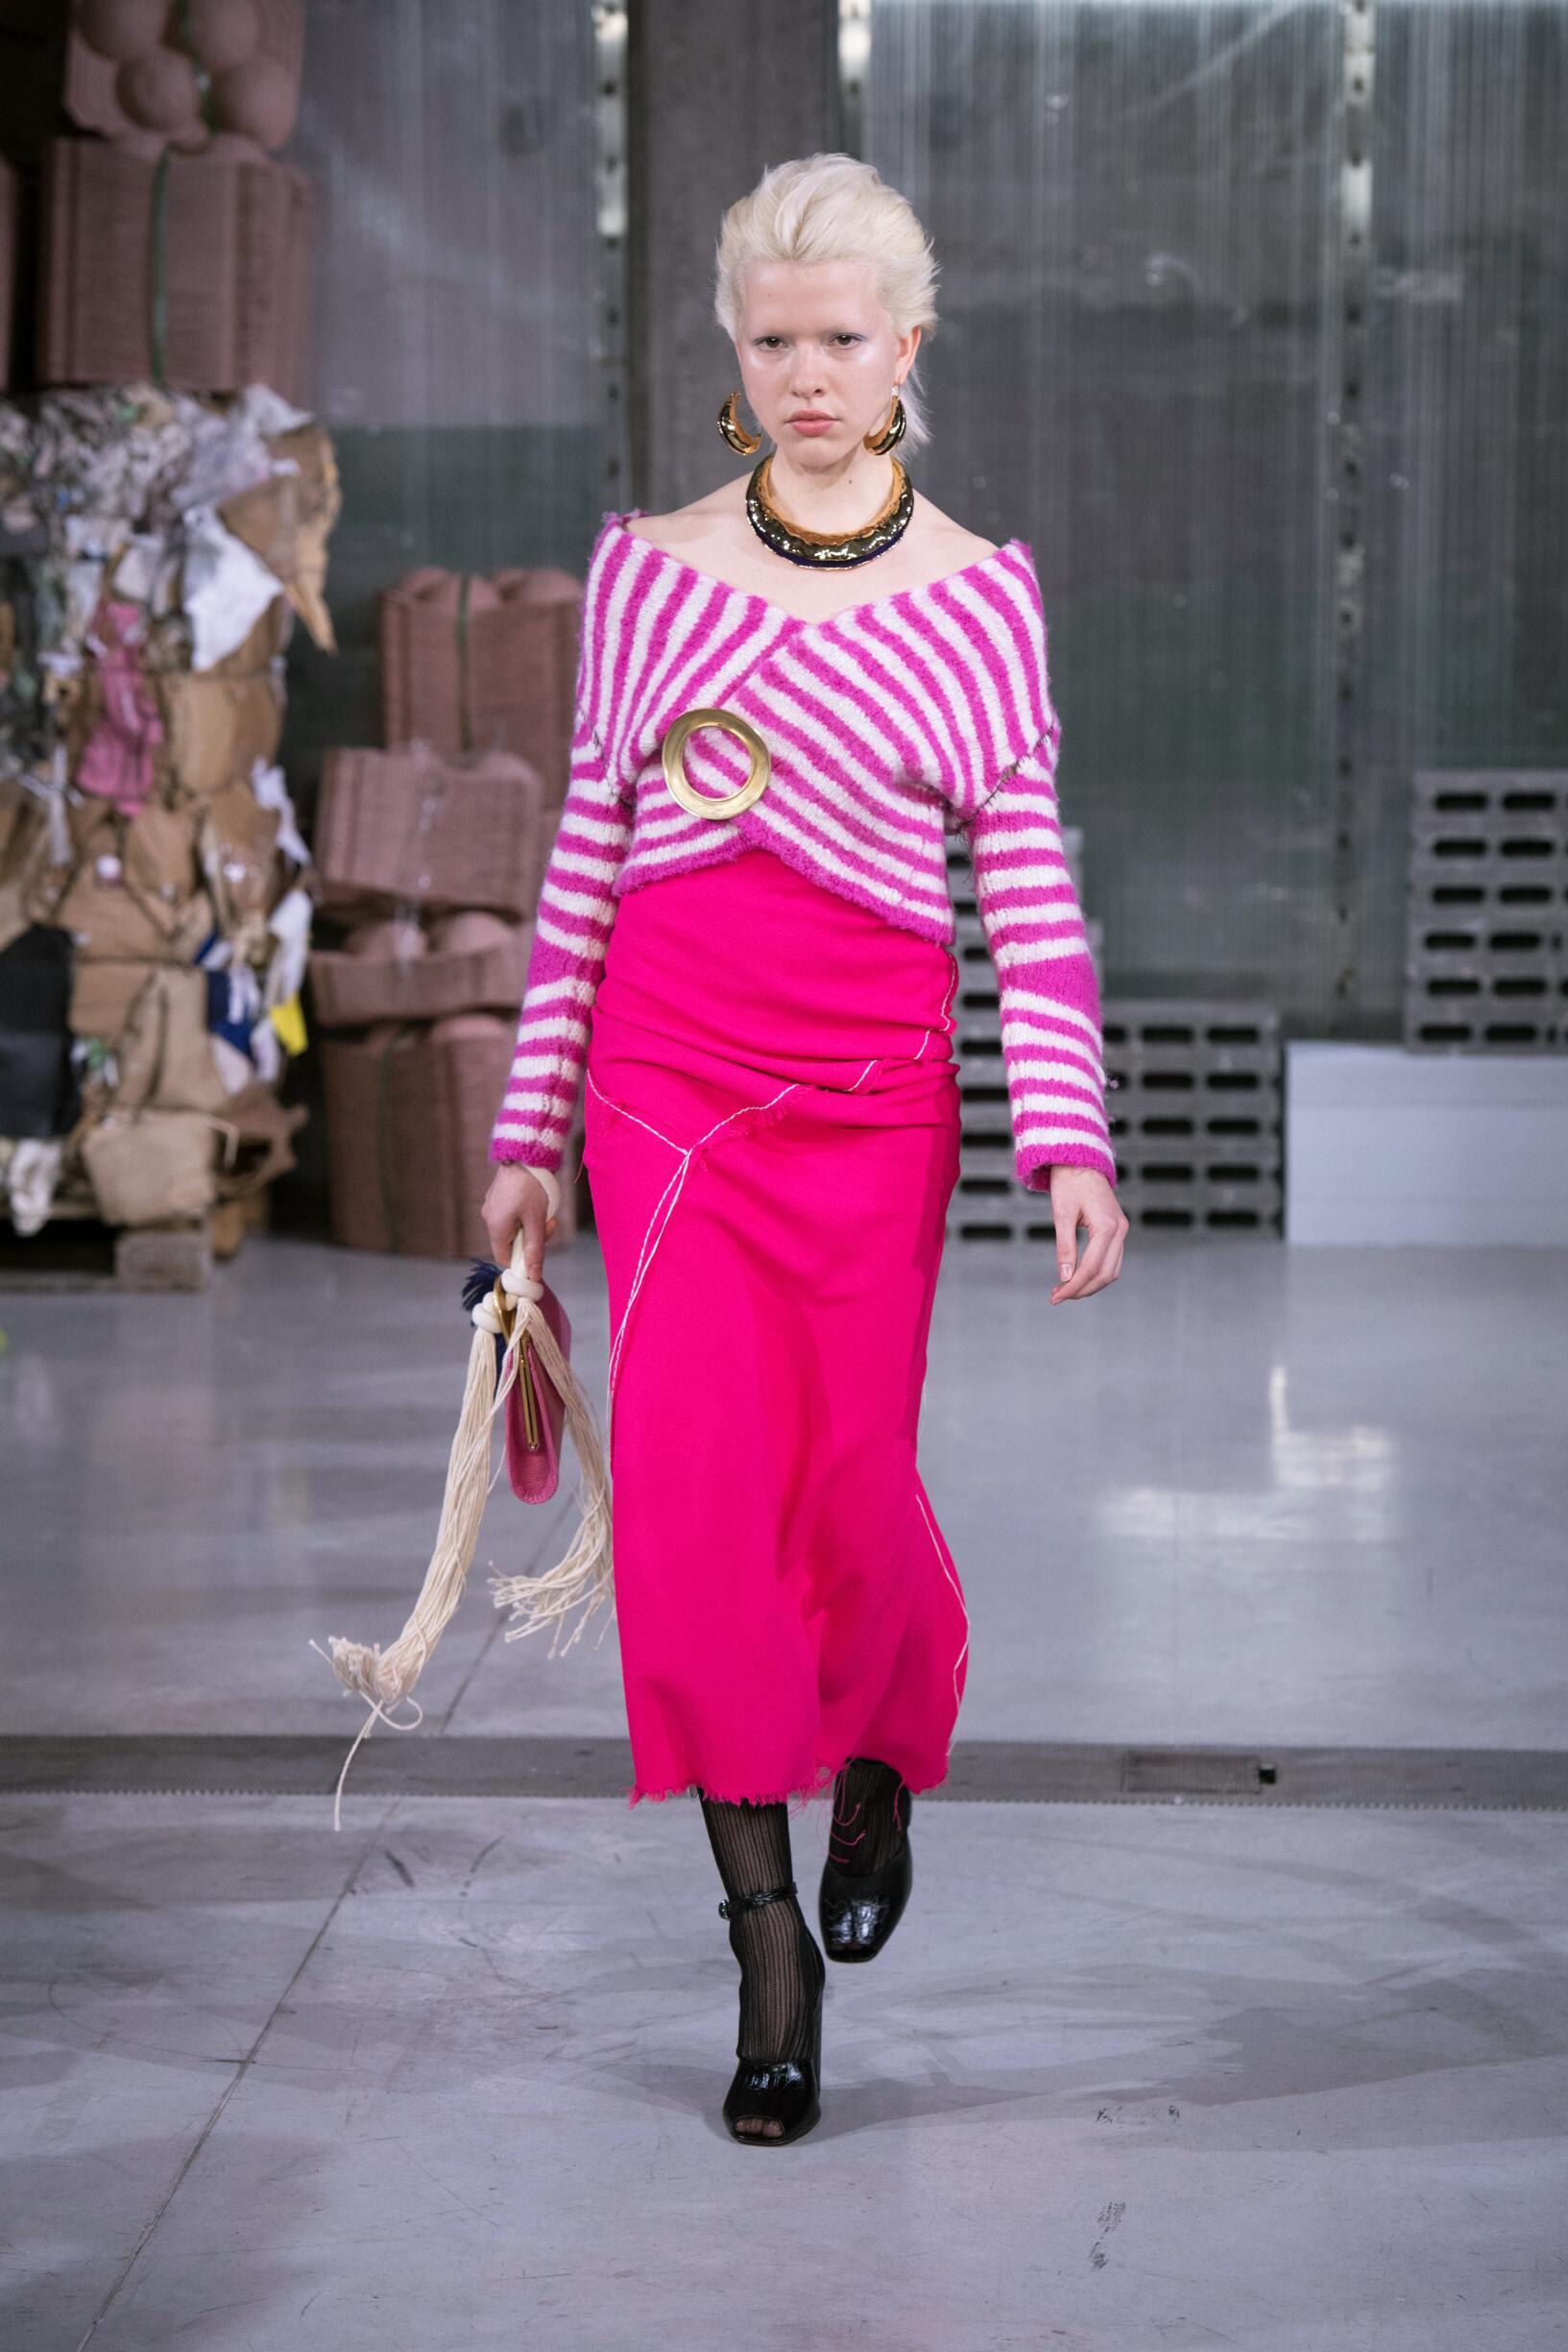 Fall Fashion Woman Trends 2018 Marni